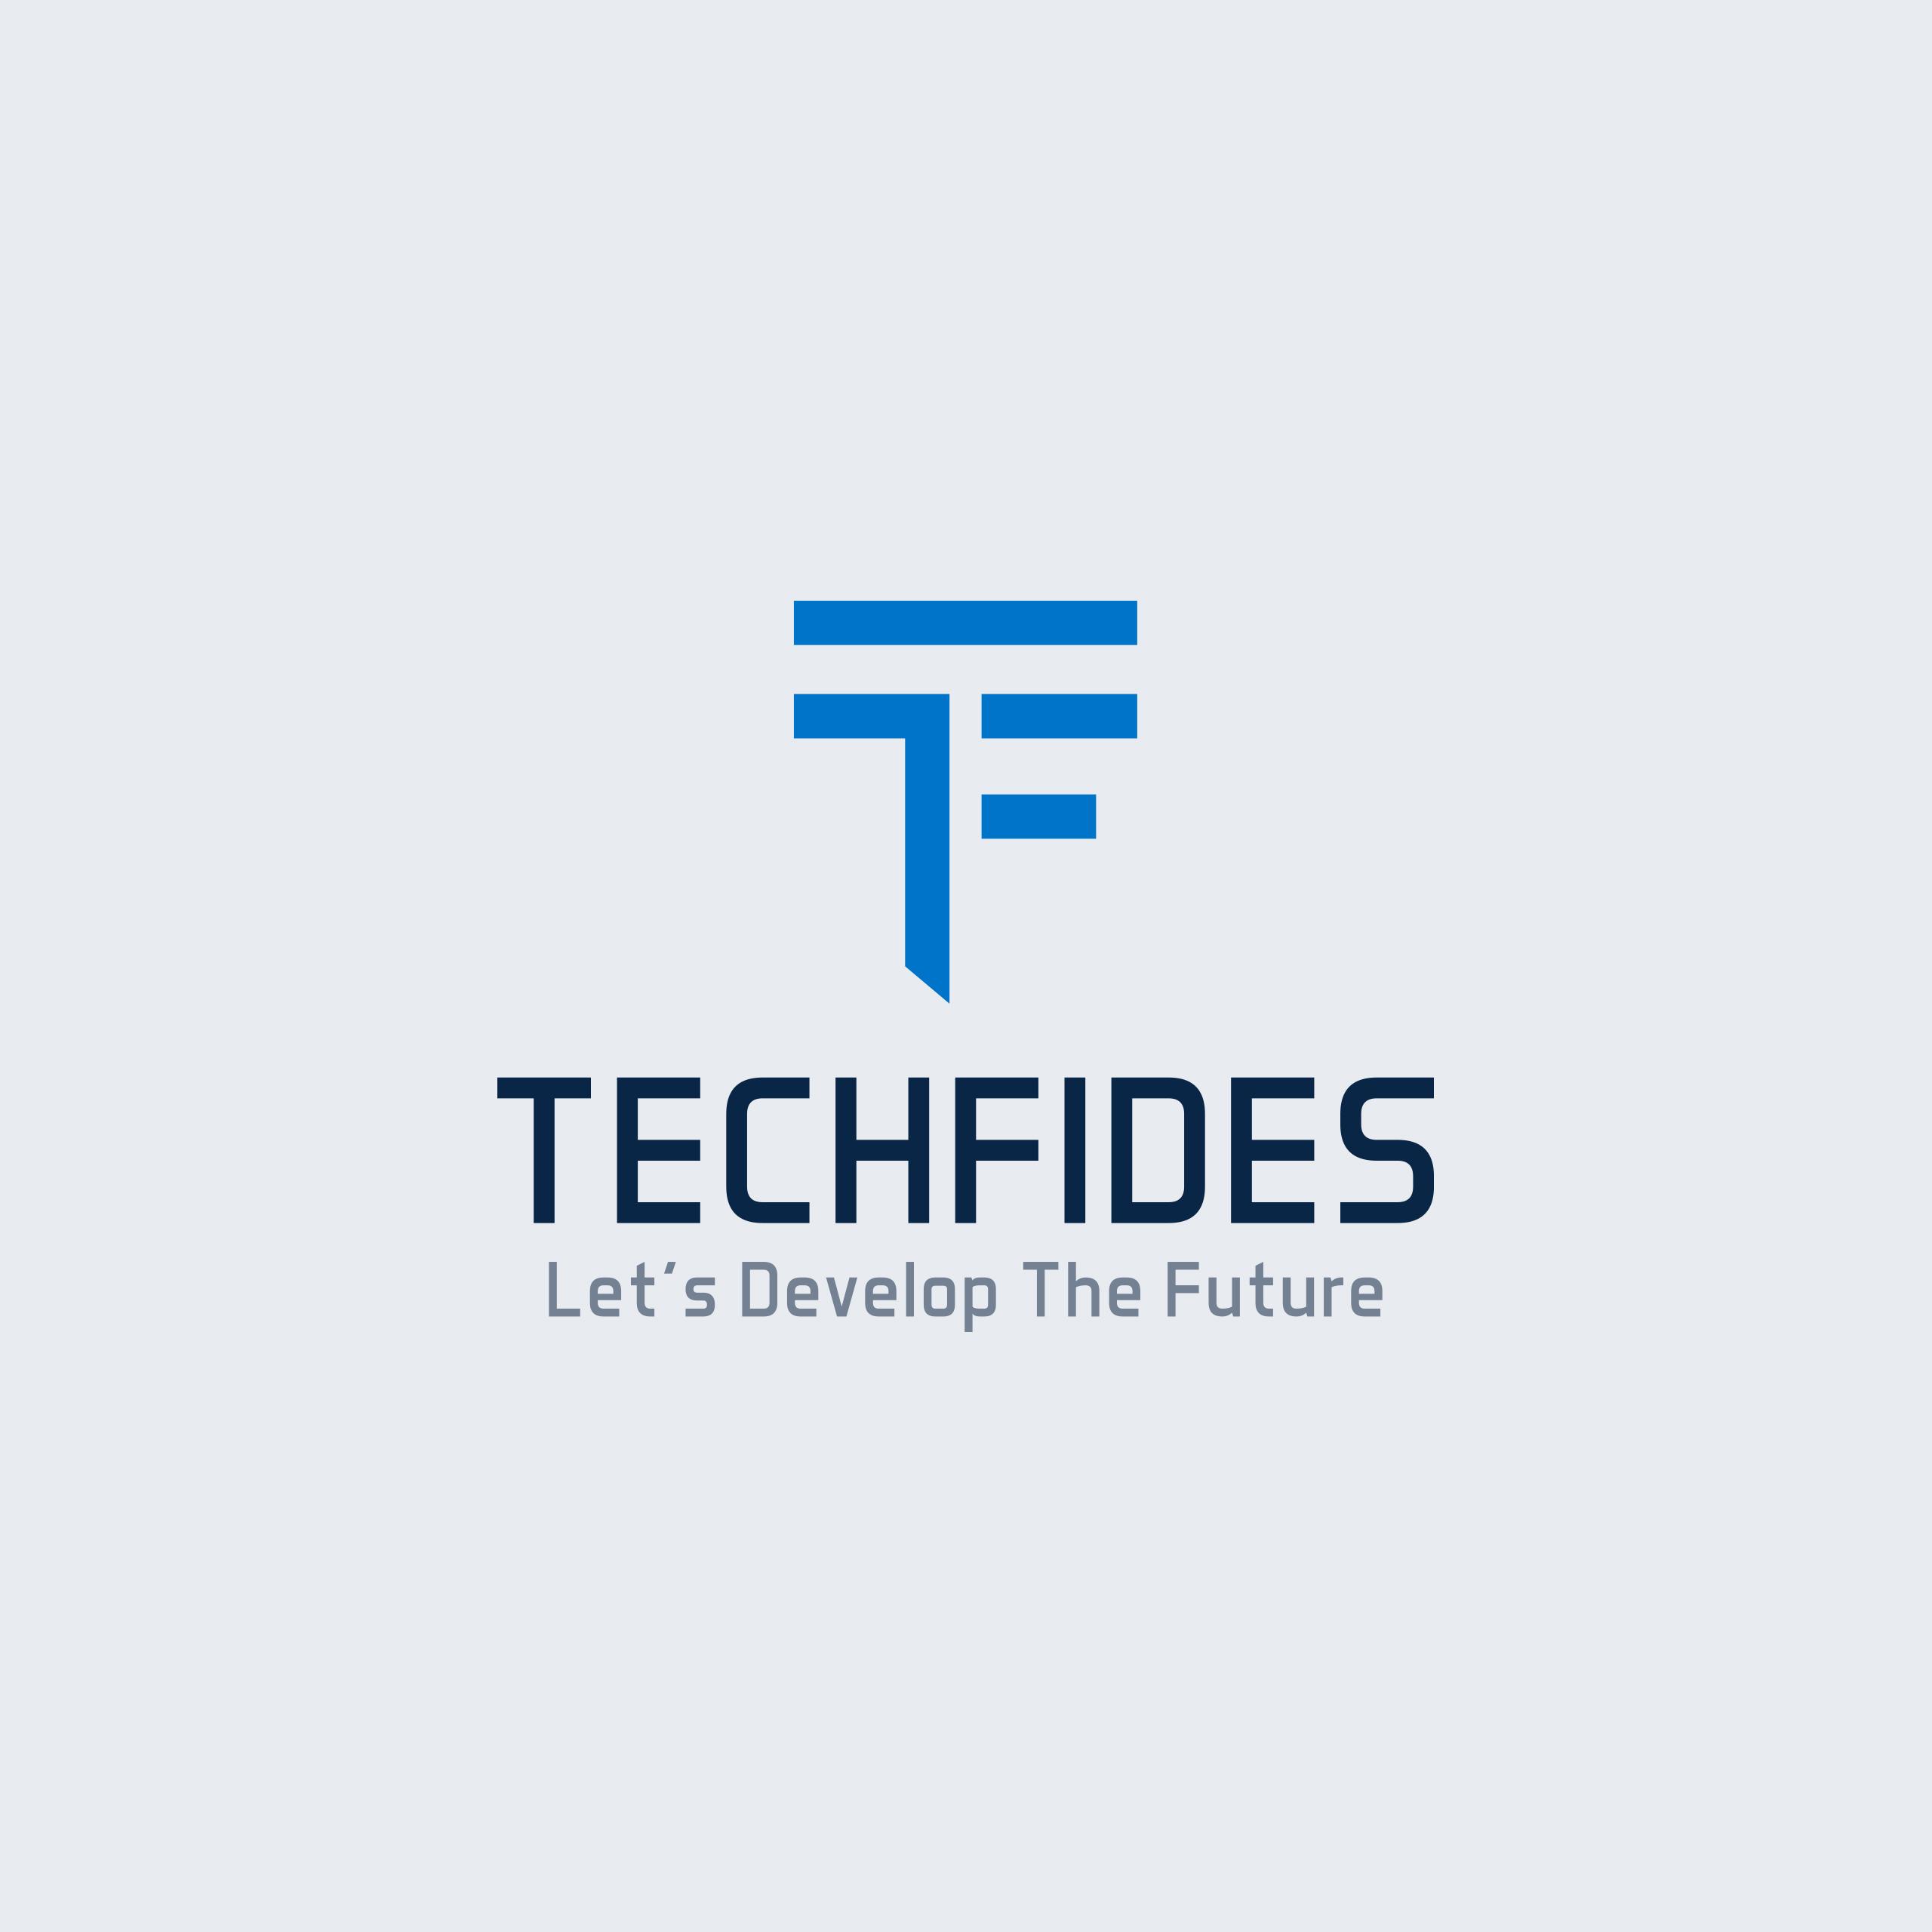 techfides-logo-rectangle-v2